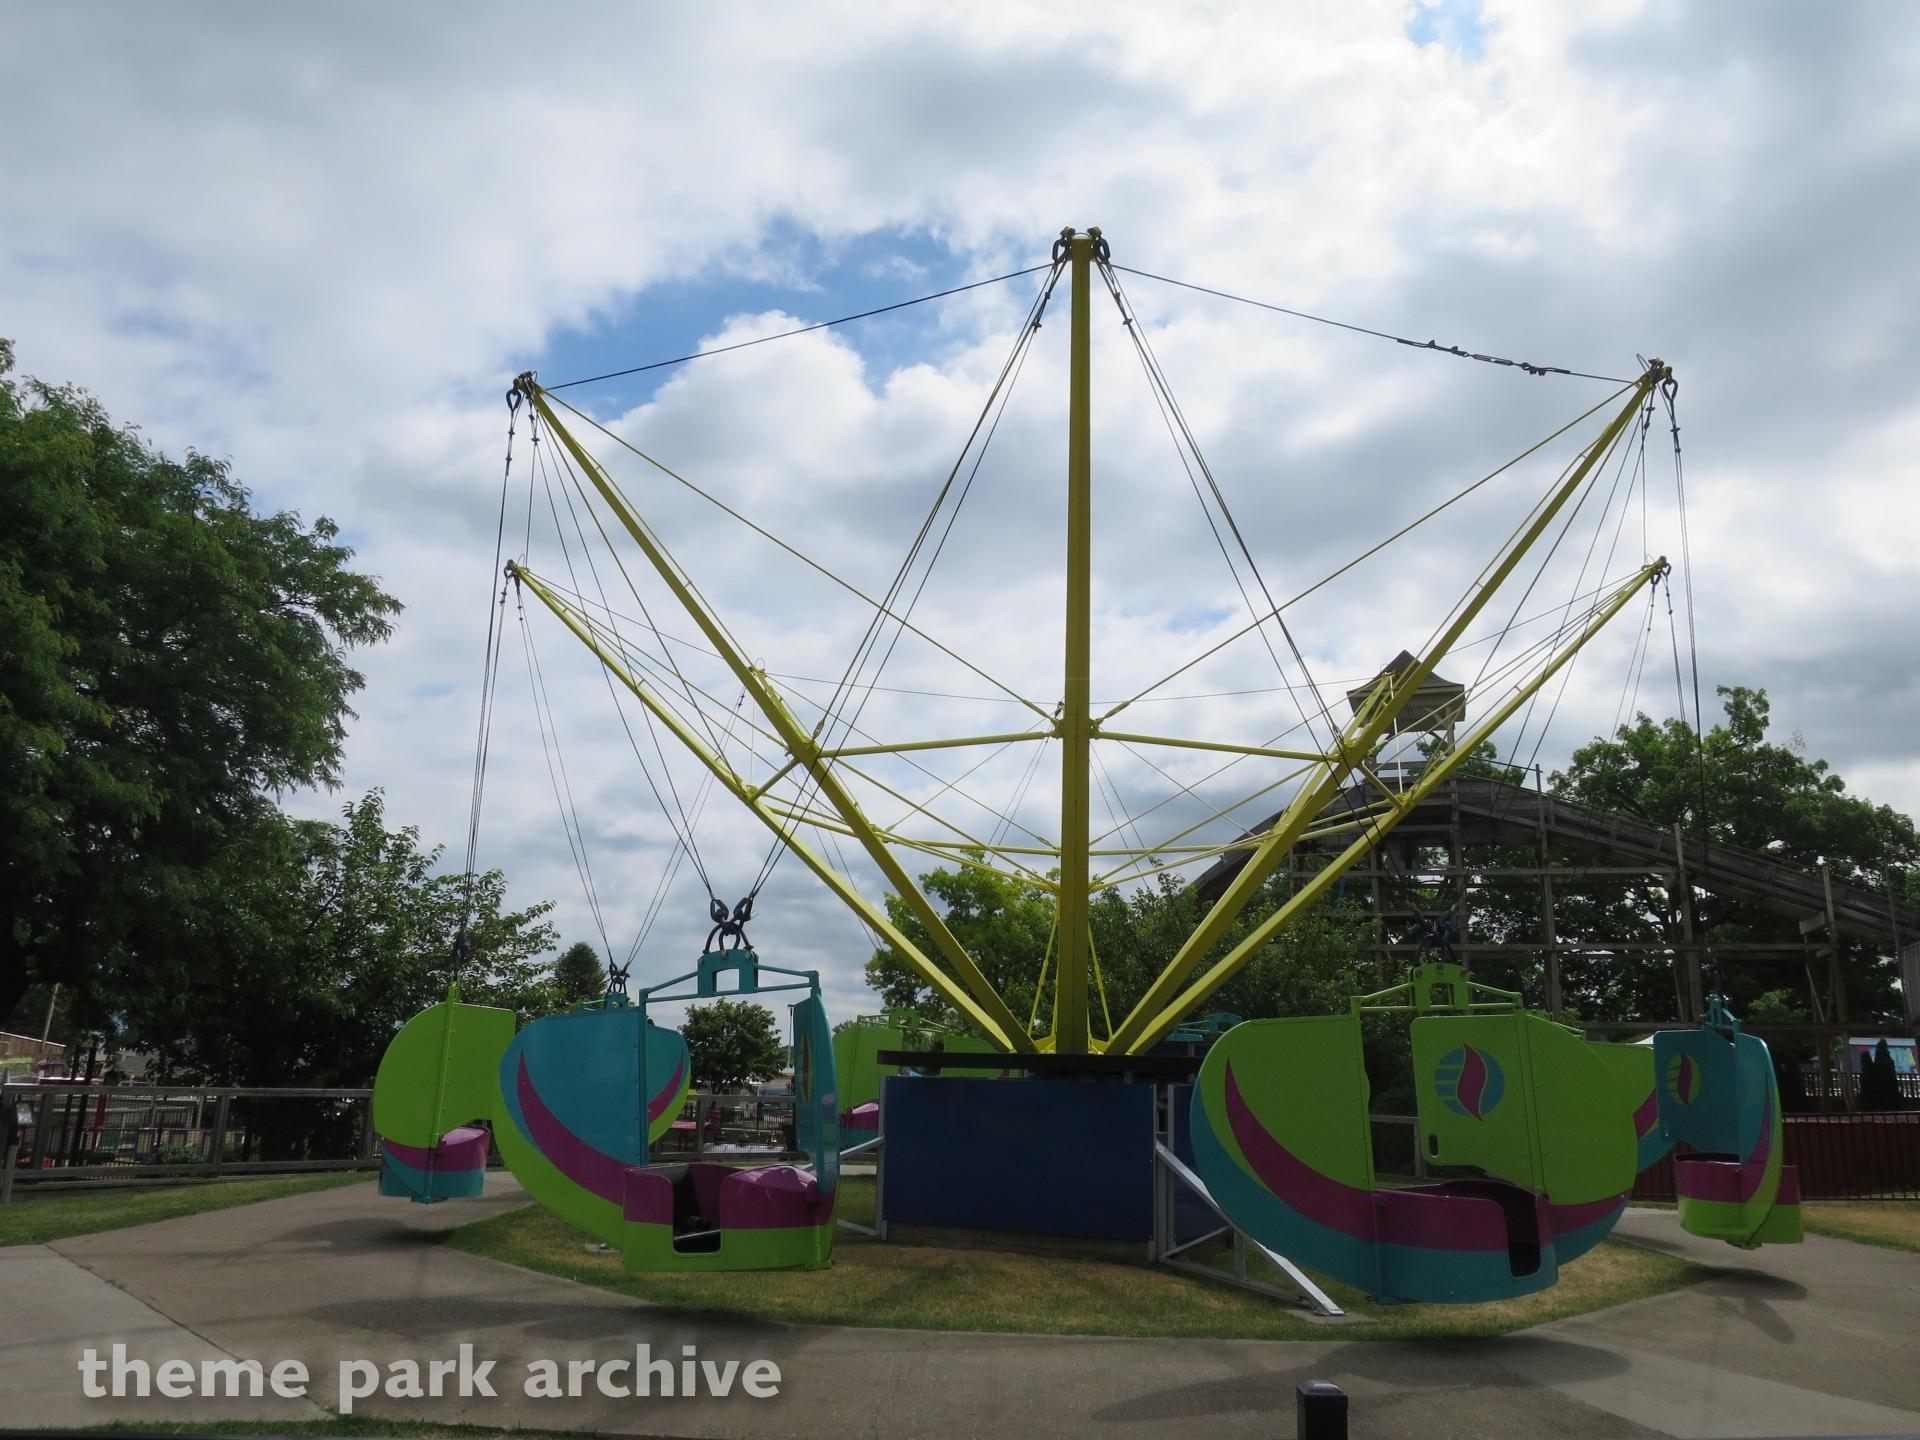 Seabreeze Flyers at Seabreeze Amusement Park